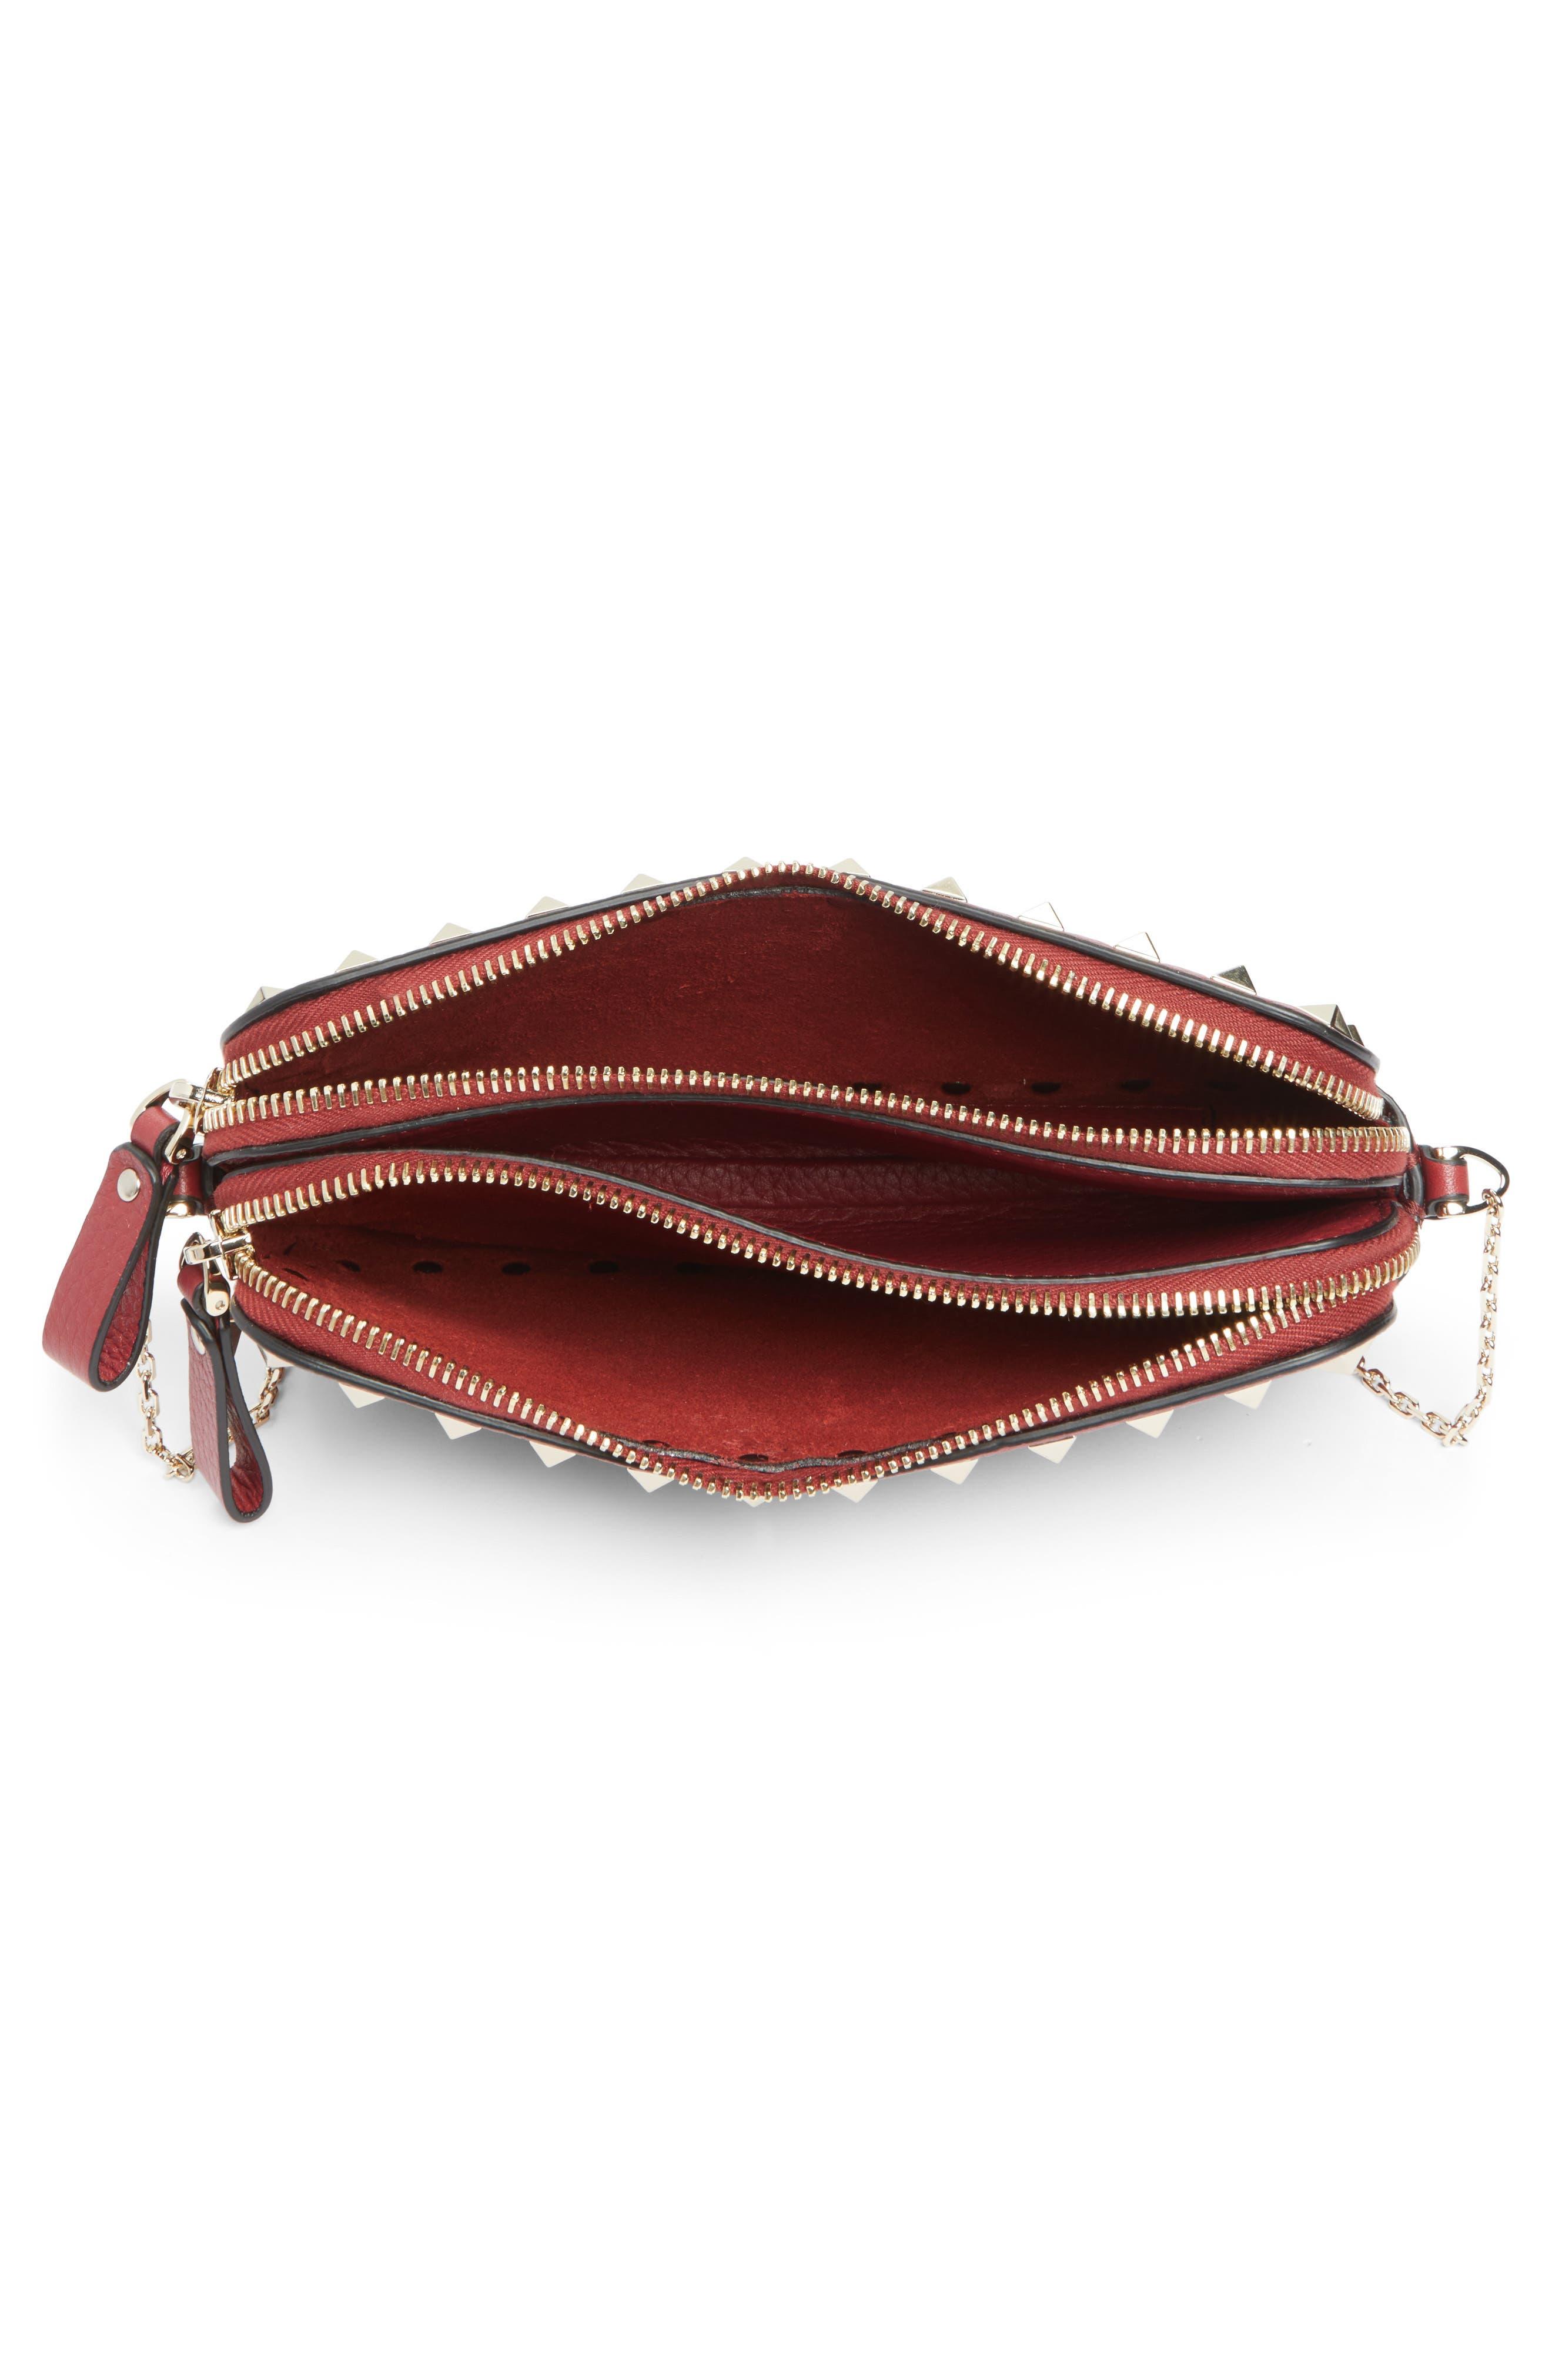 VALENTINO GARAVANI, Rockstud Leather Crossbody Bag, Alternate thumbnail 4, color, RUBIN